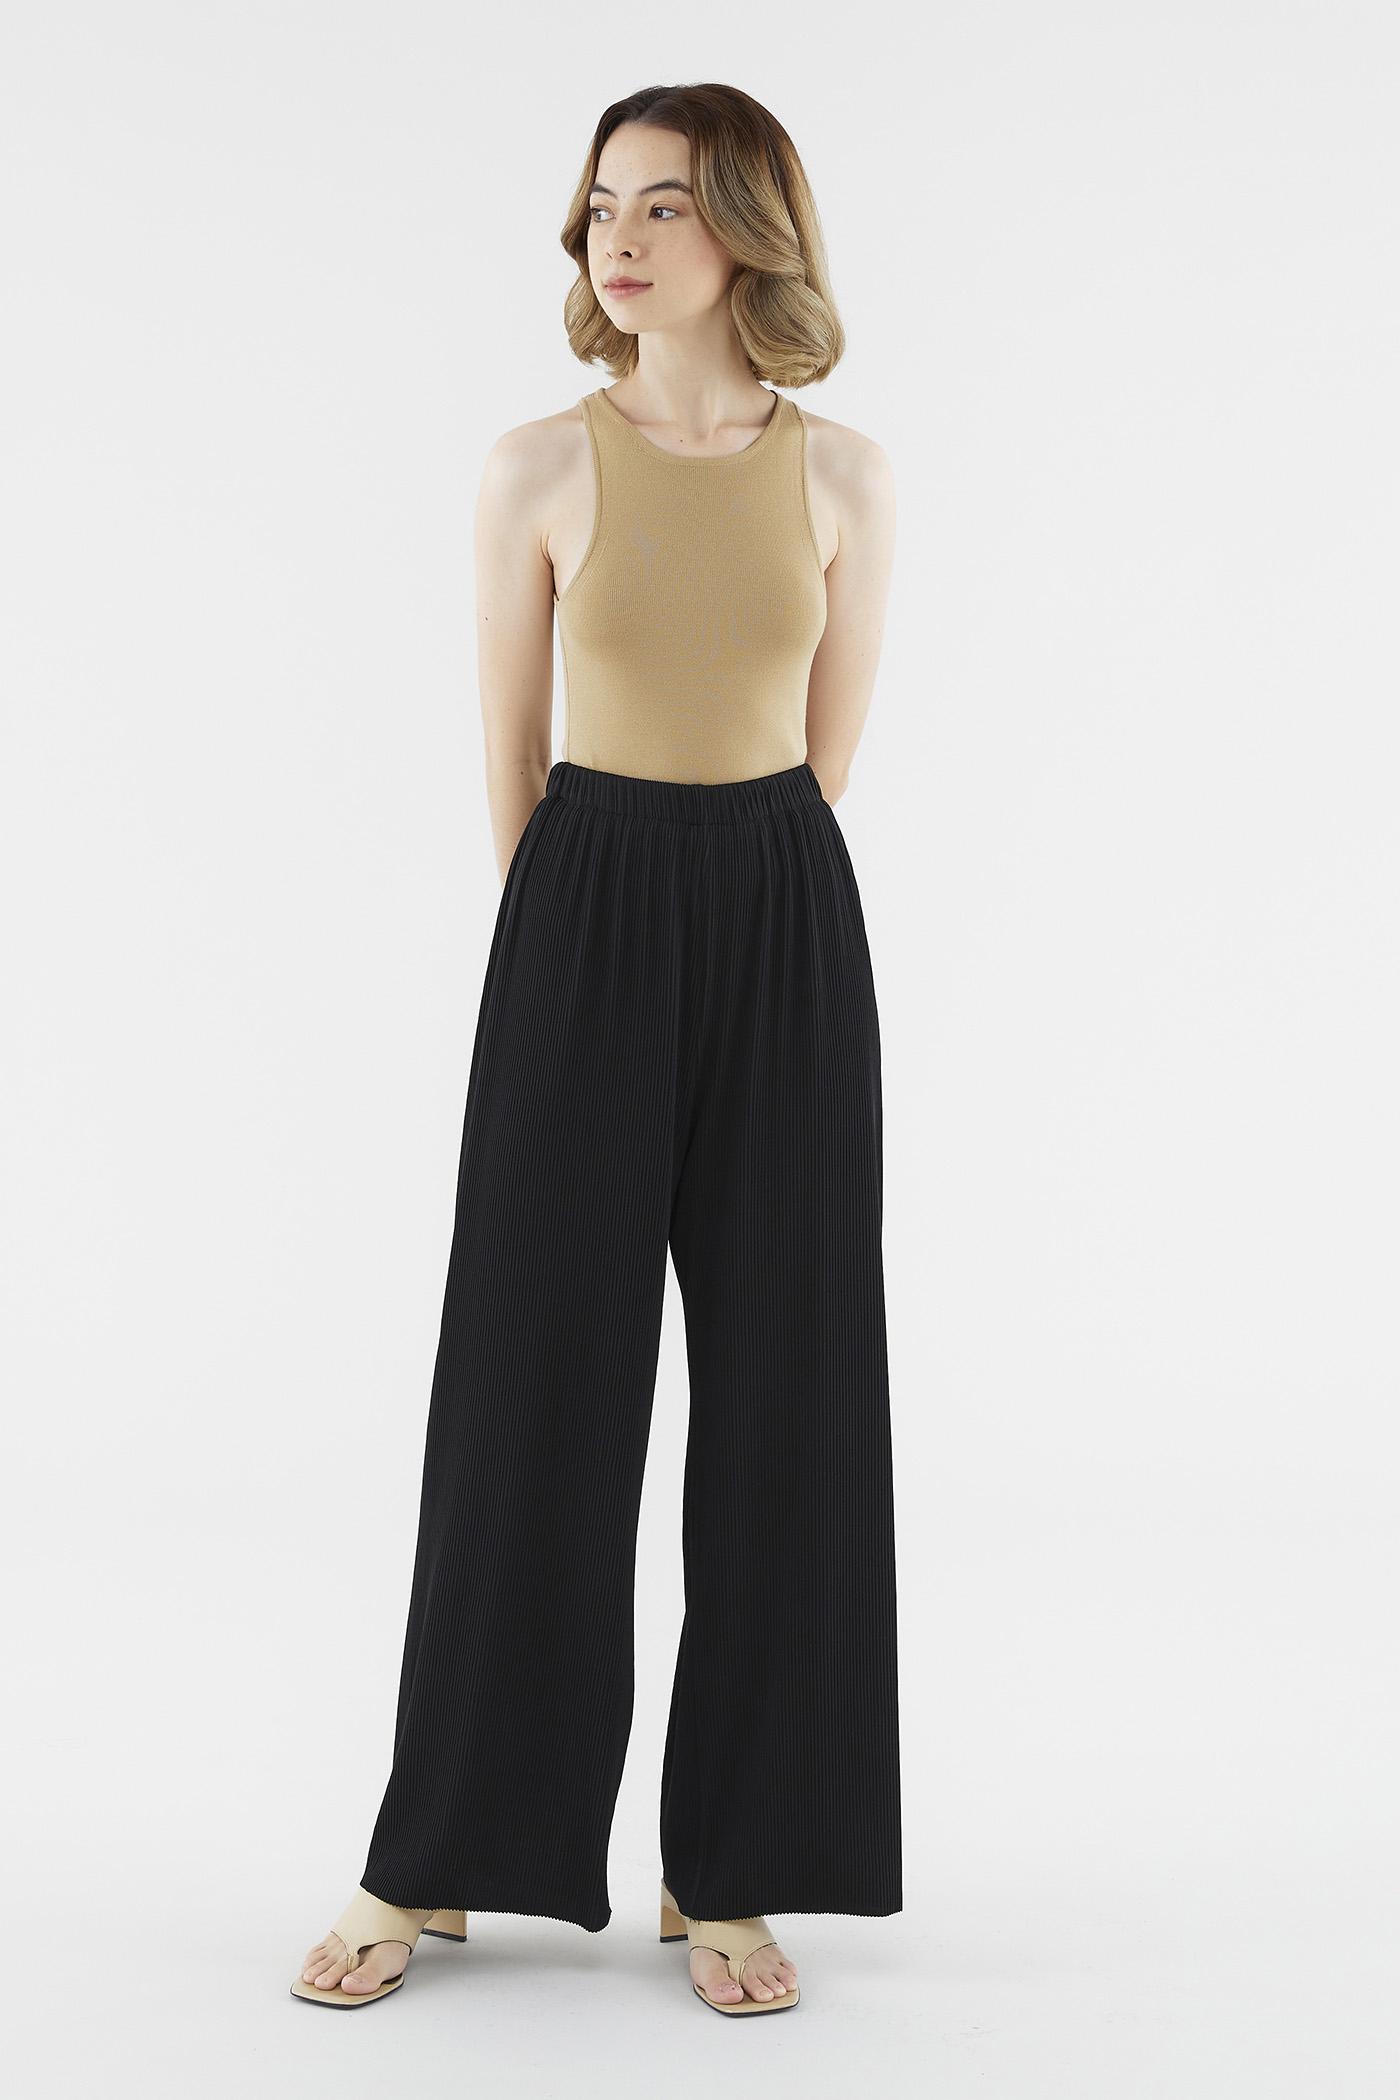 Gracen Ribbed Pants